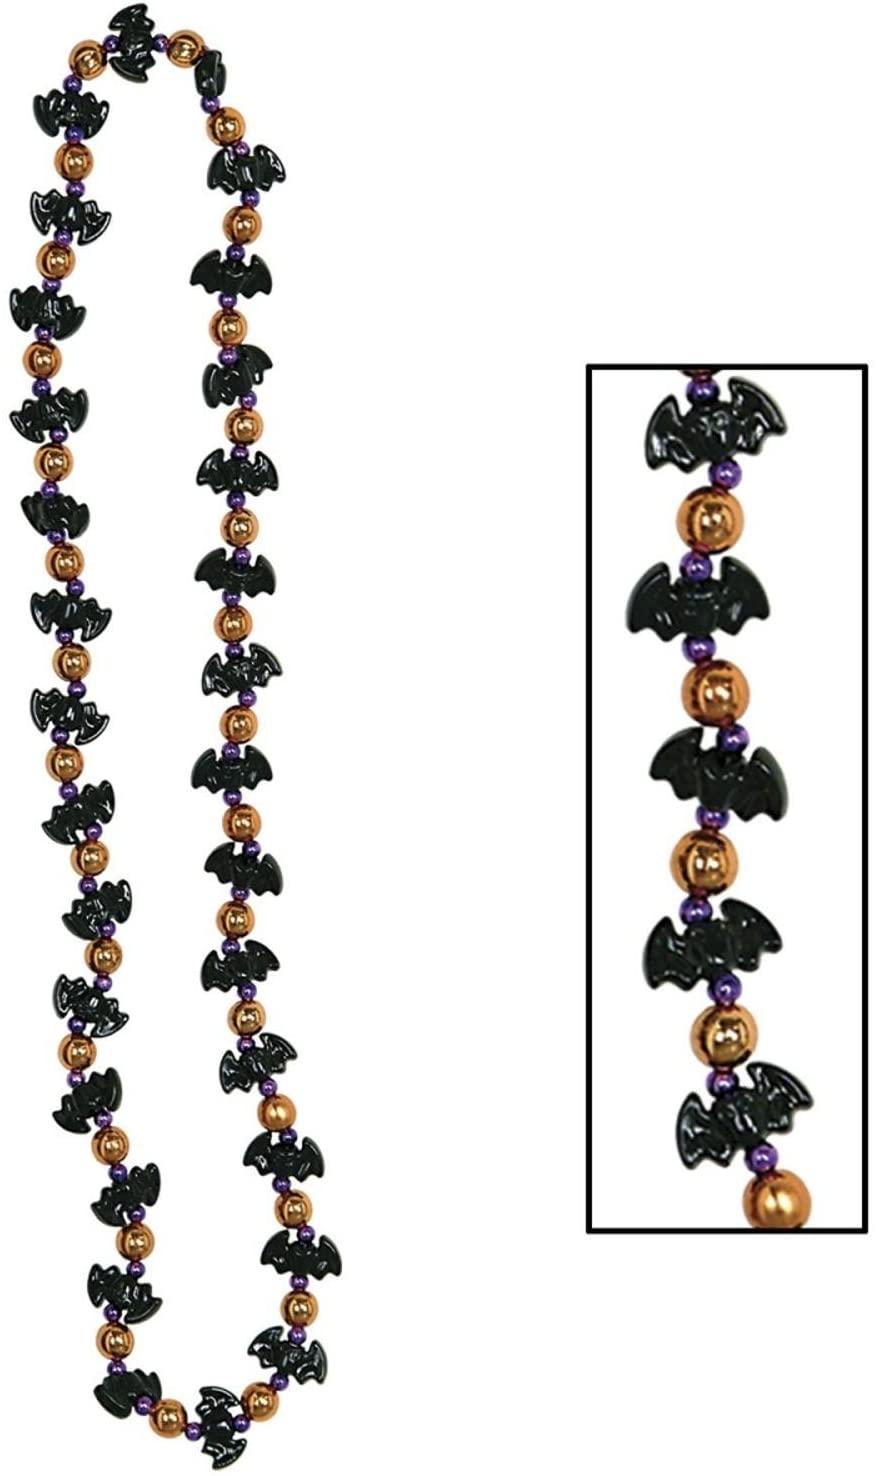 Club Pack of 12 Black and Orange Halloween